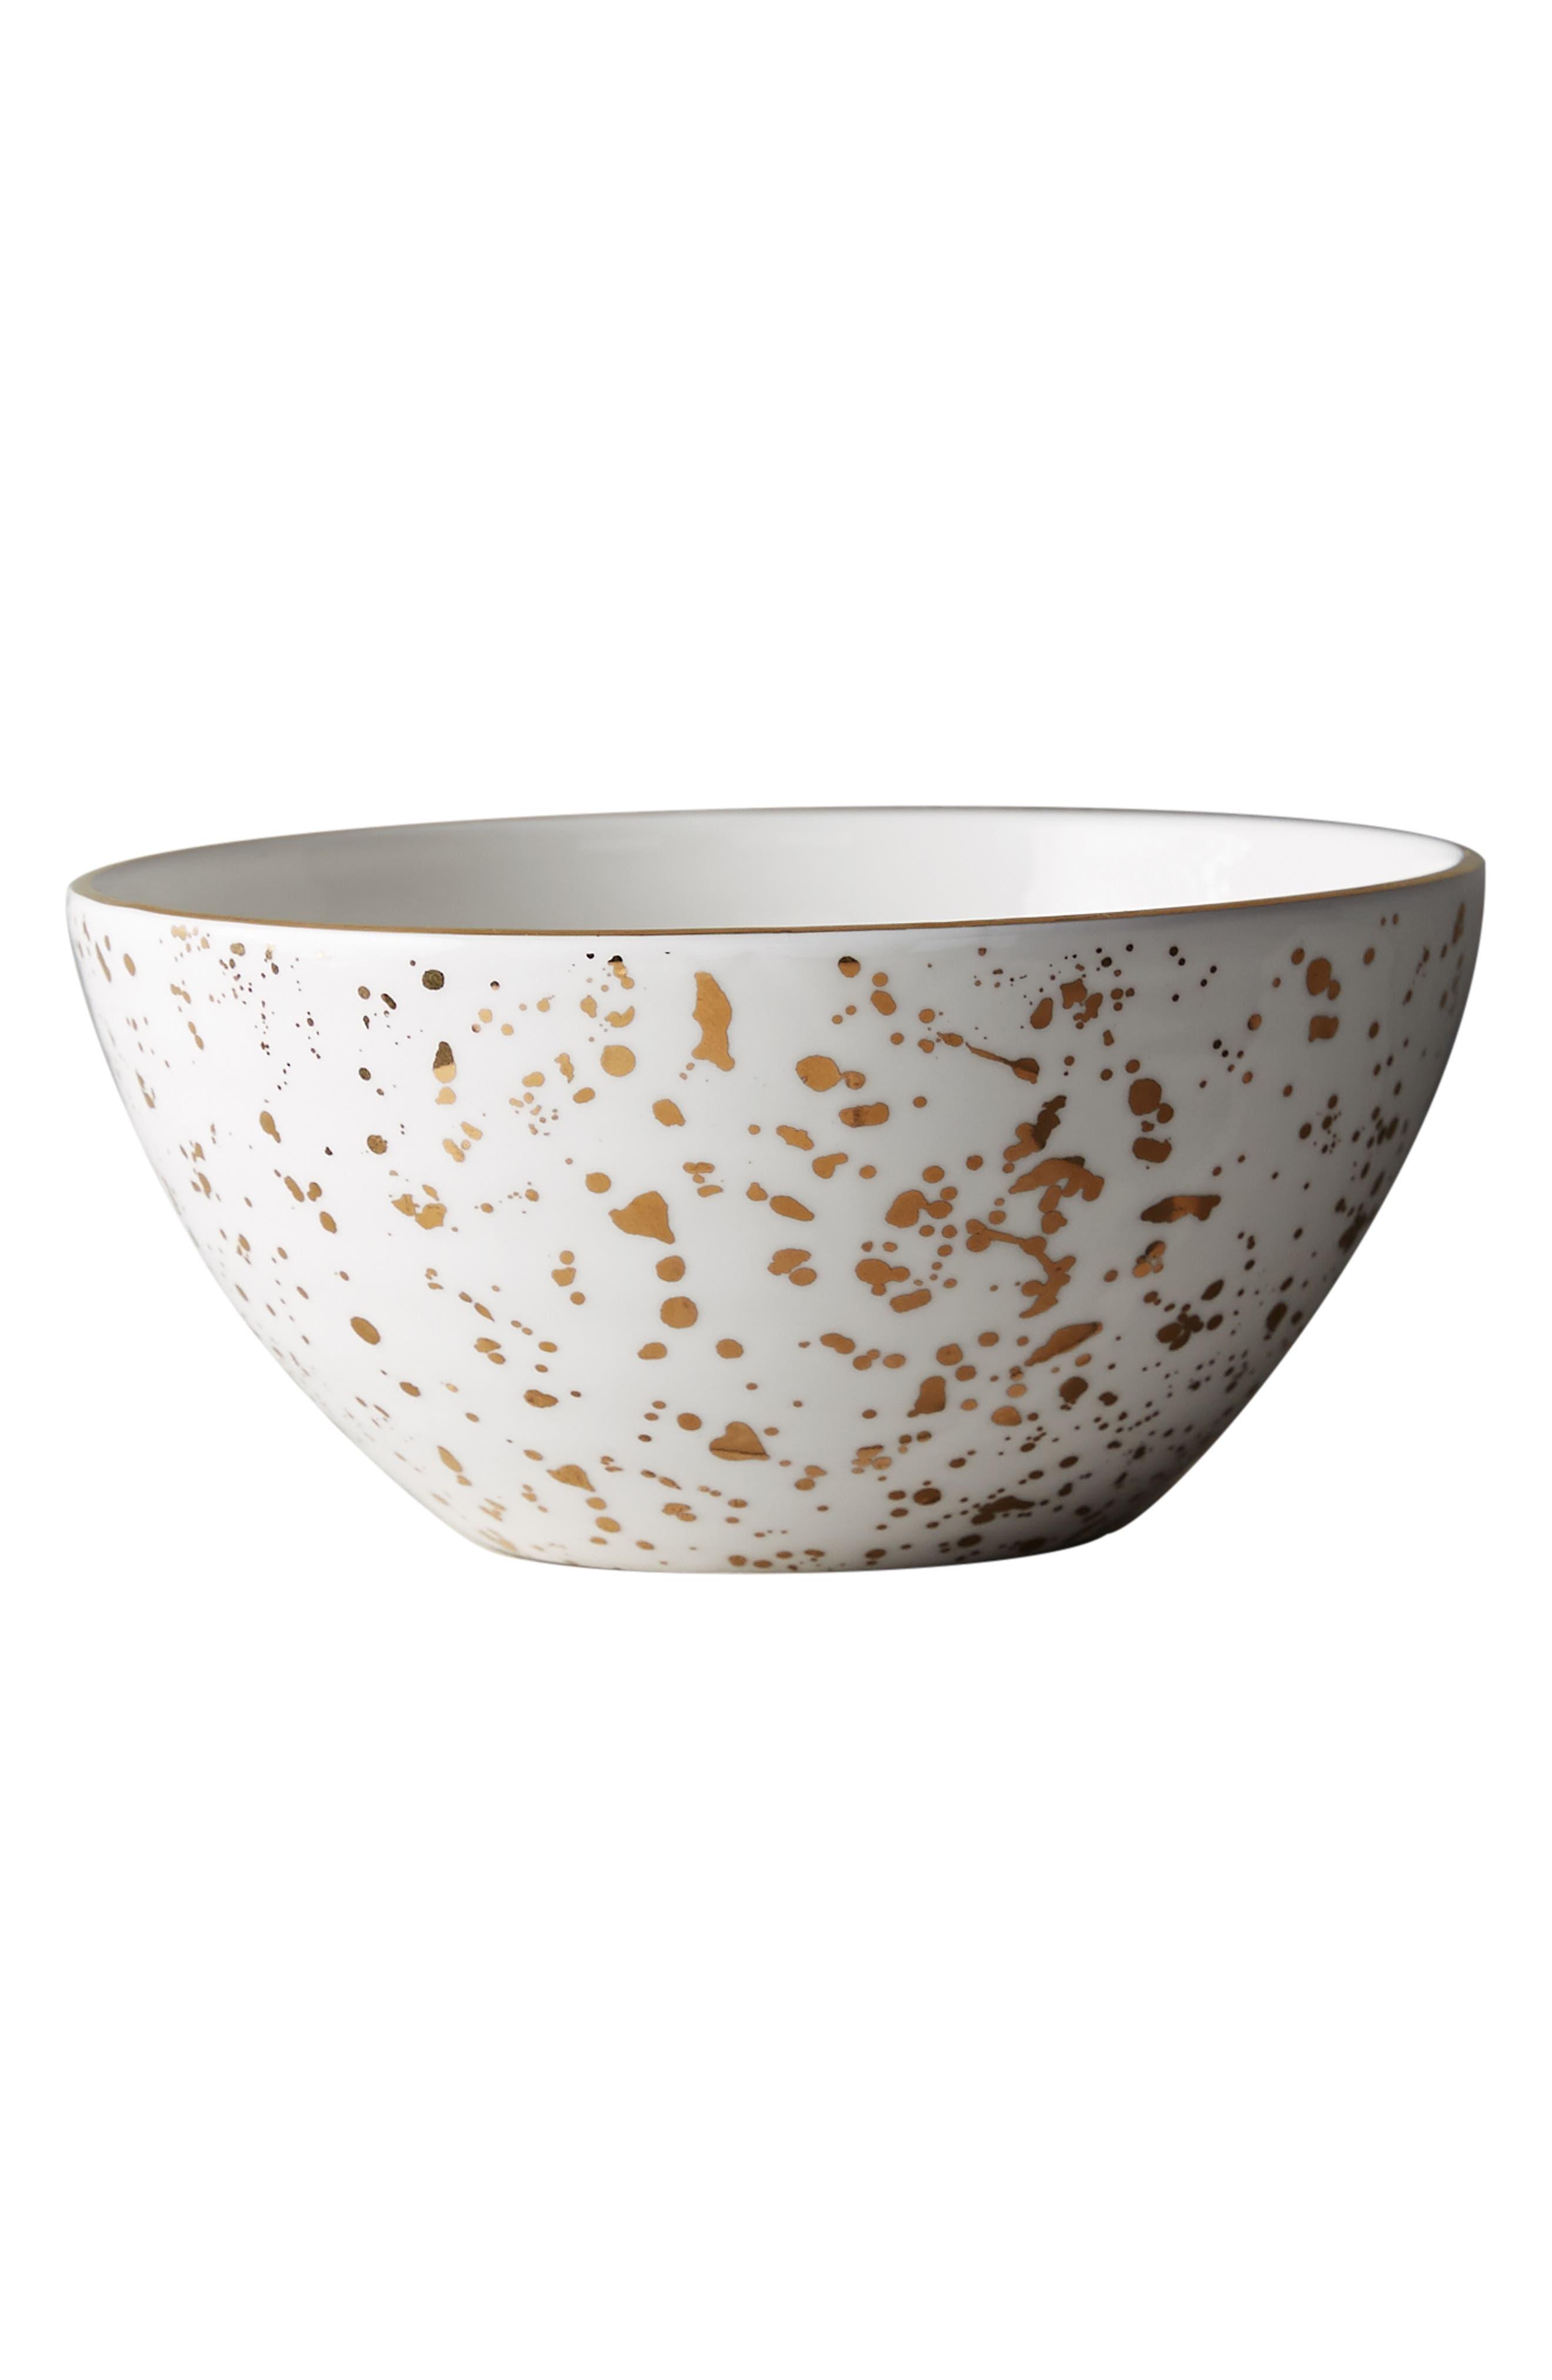 Alternate Image 3  - Anthropologie Mimira Stoneware Bowl